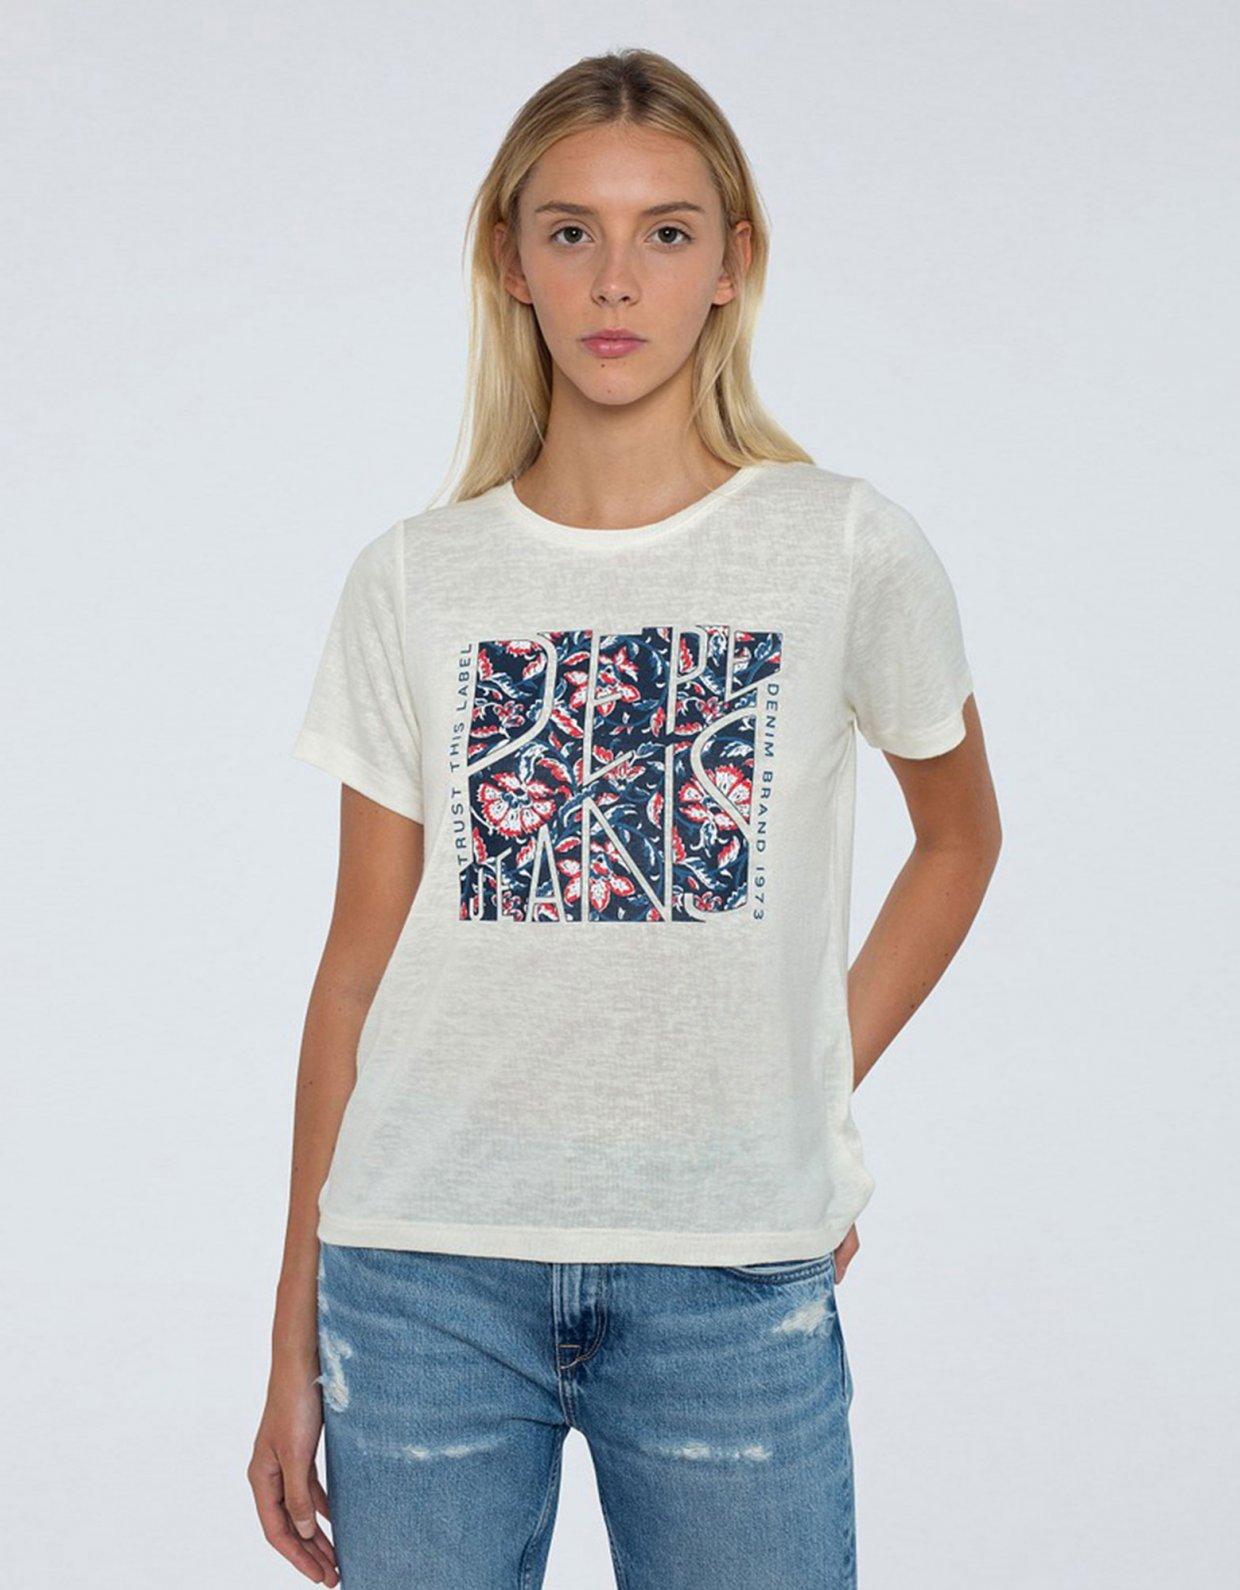 PEPE JEANS Brooklyn t-shirt white